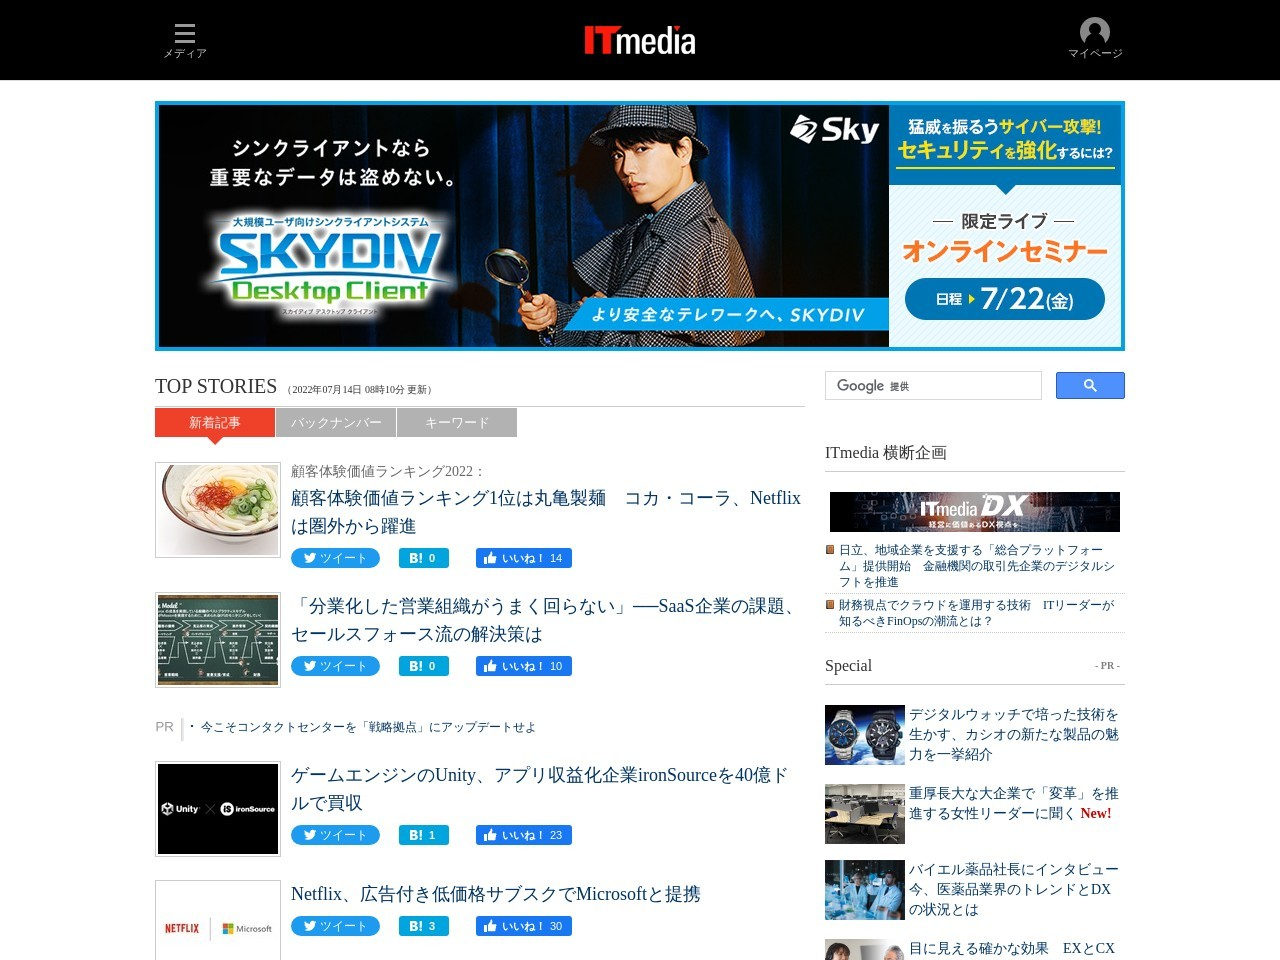 http://www.itmedia.co.jp/news/articles/1401/30/news035.html